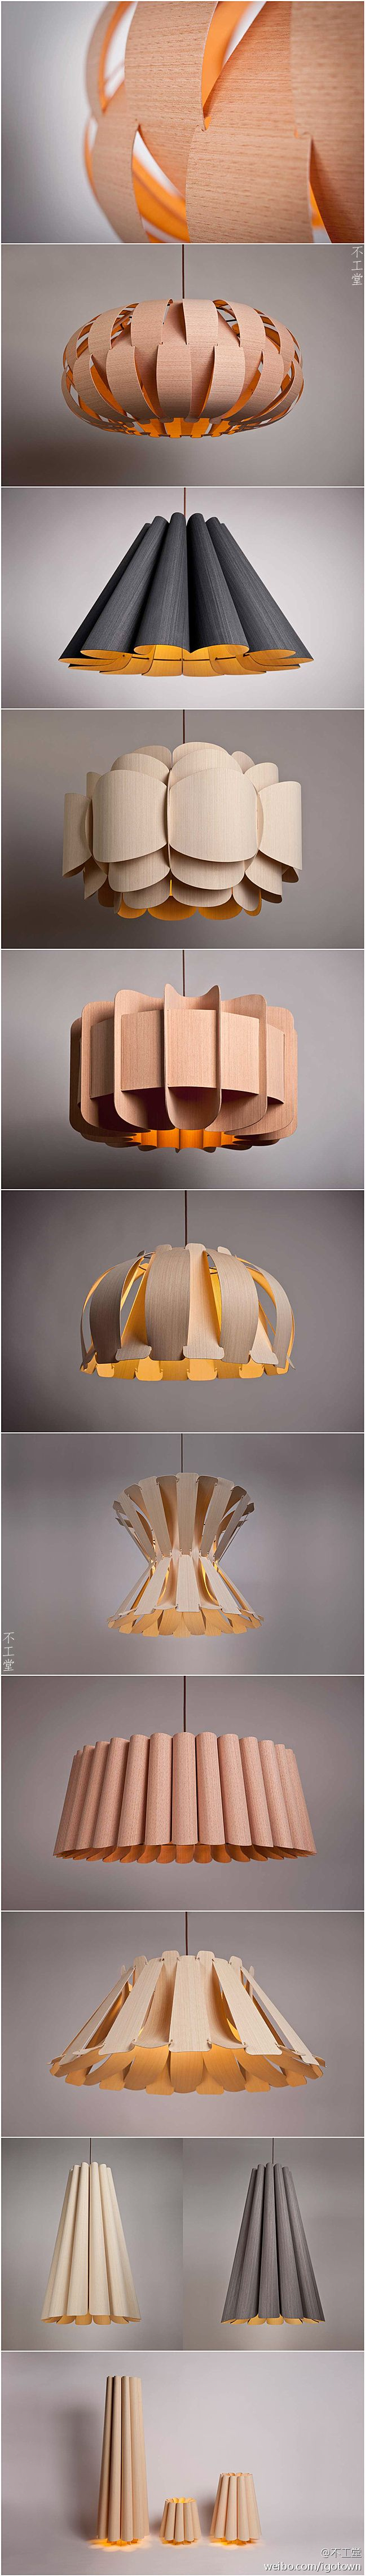 variations on a theme... (wood veneer?)